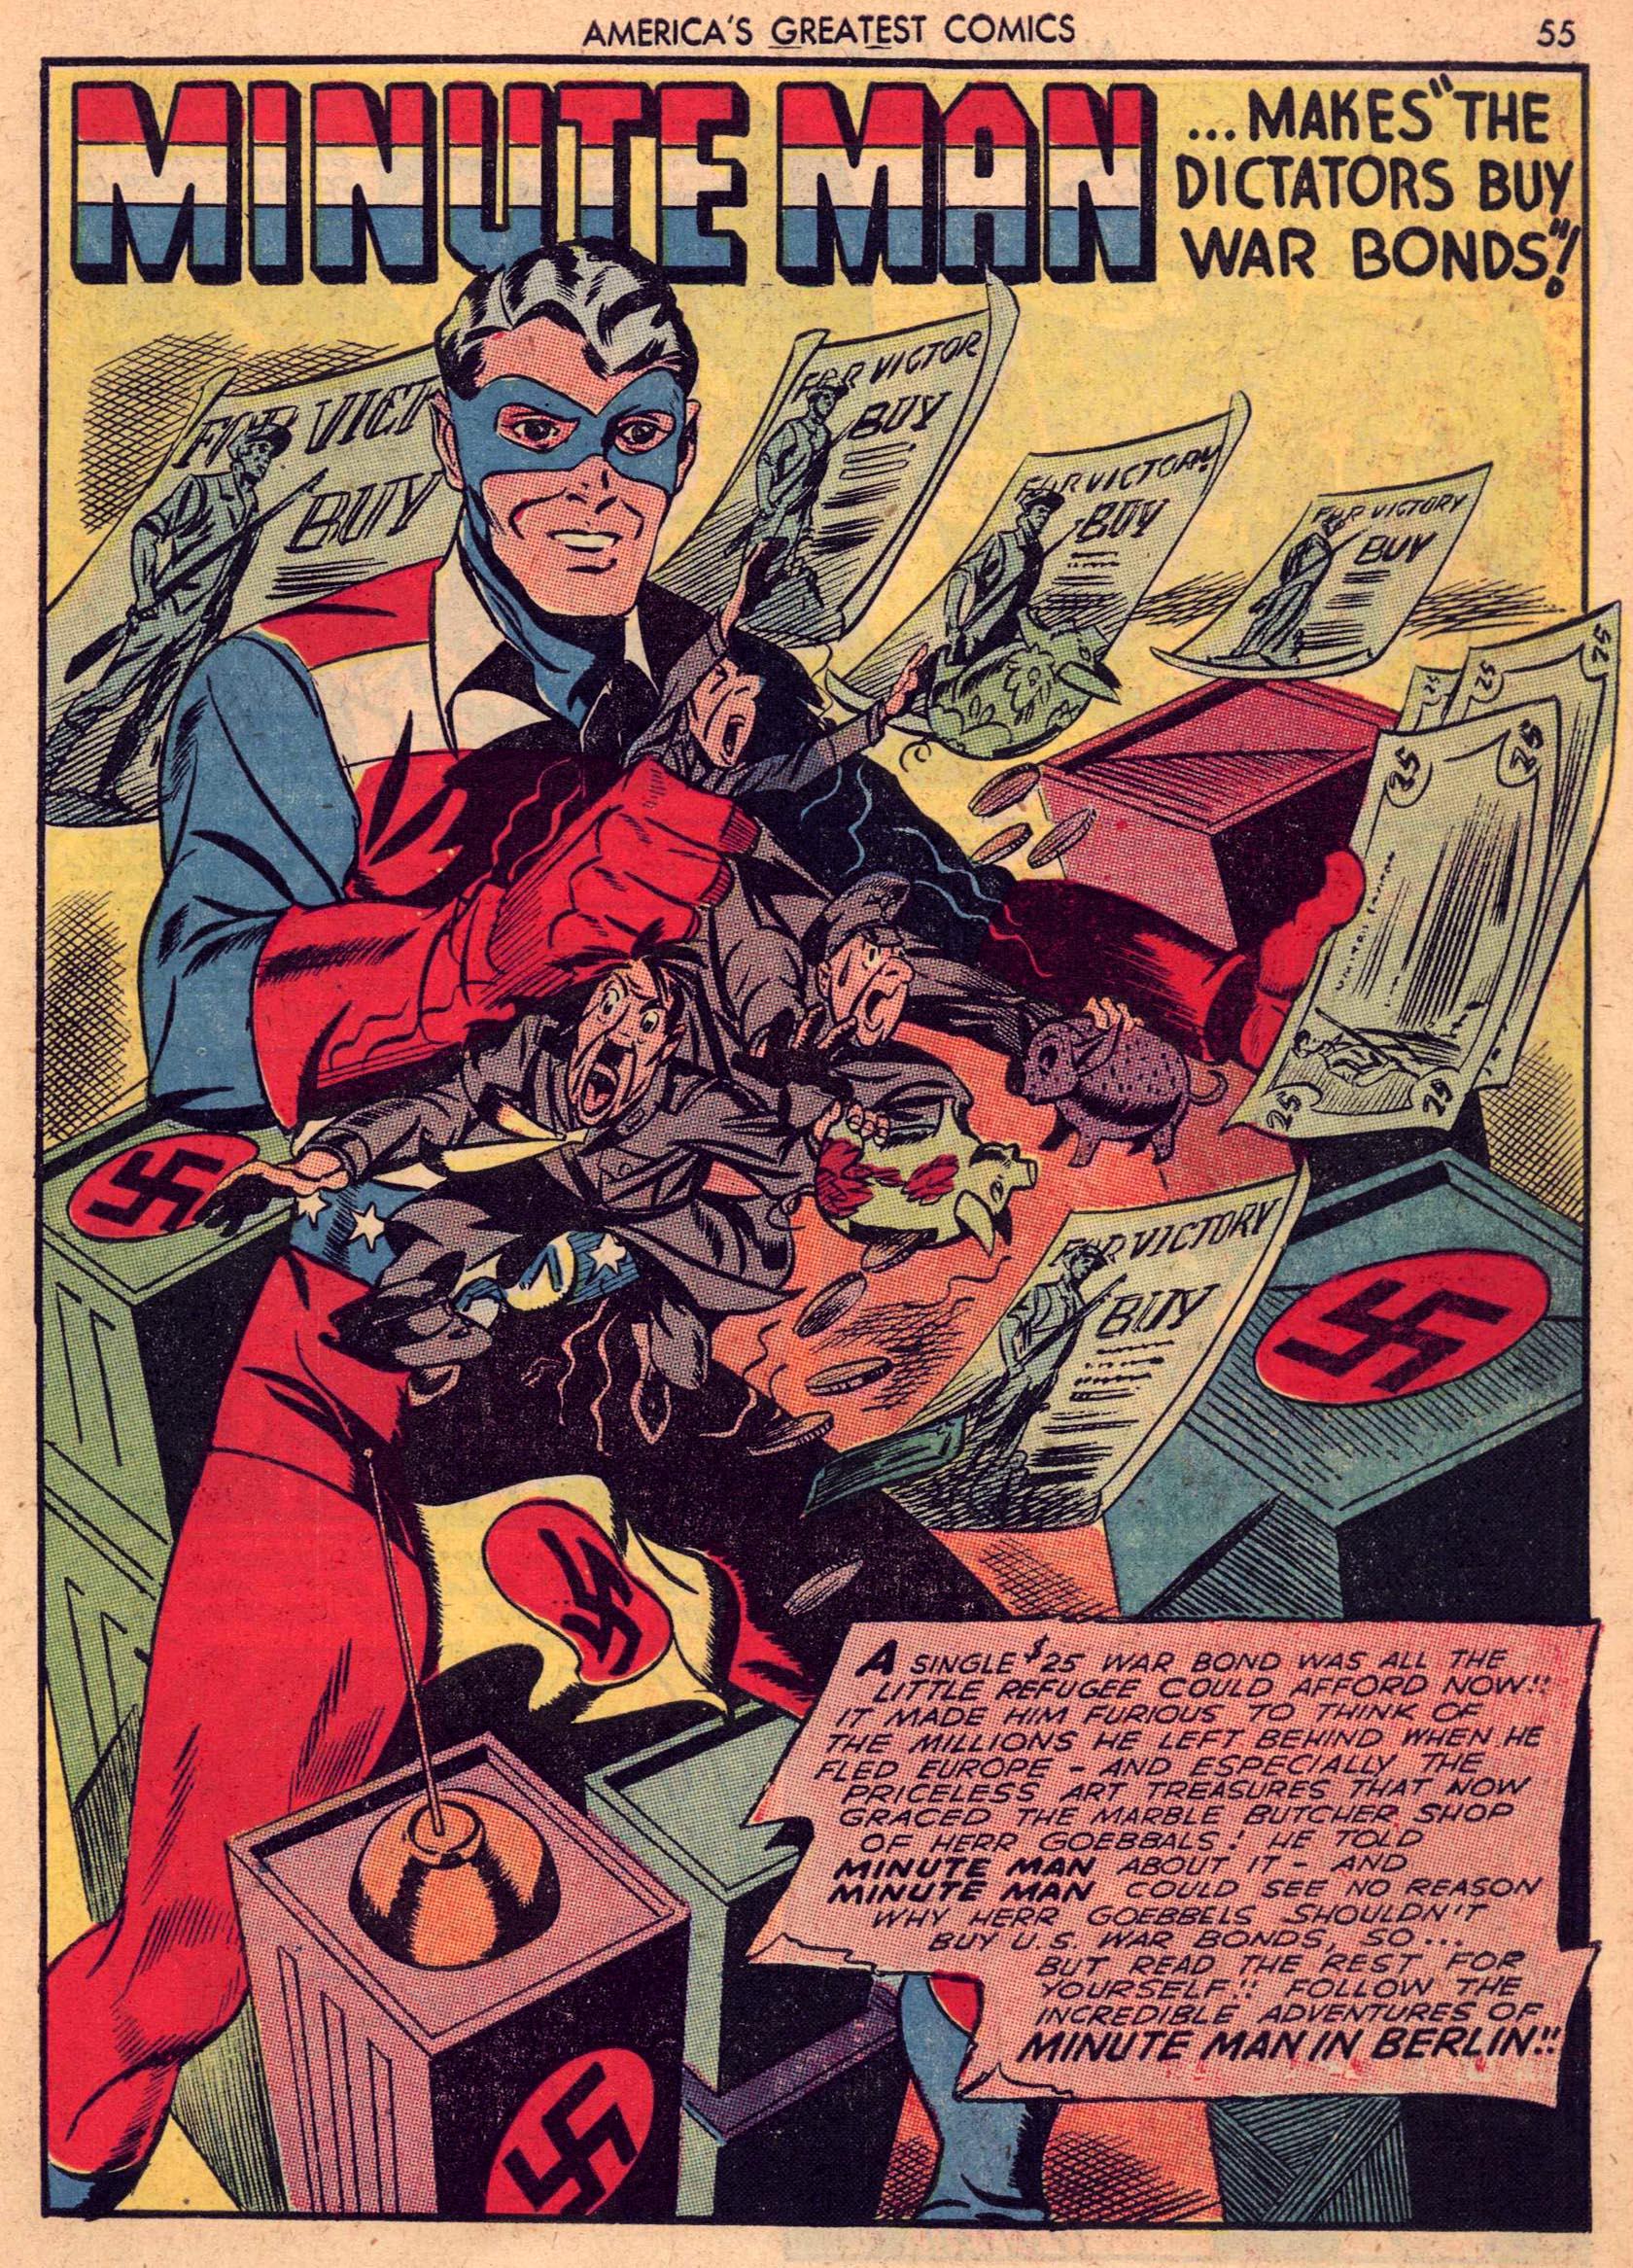 Read online America's Greatest Comics comic -  Issue #7 - 54